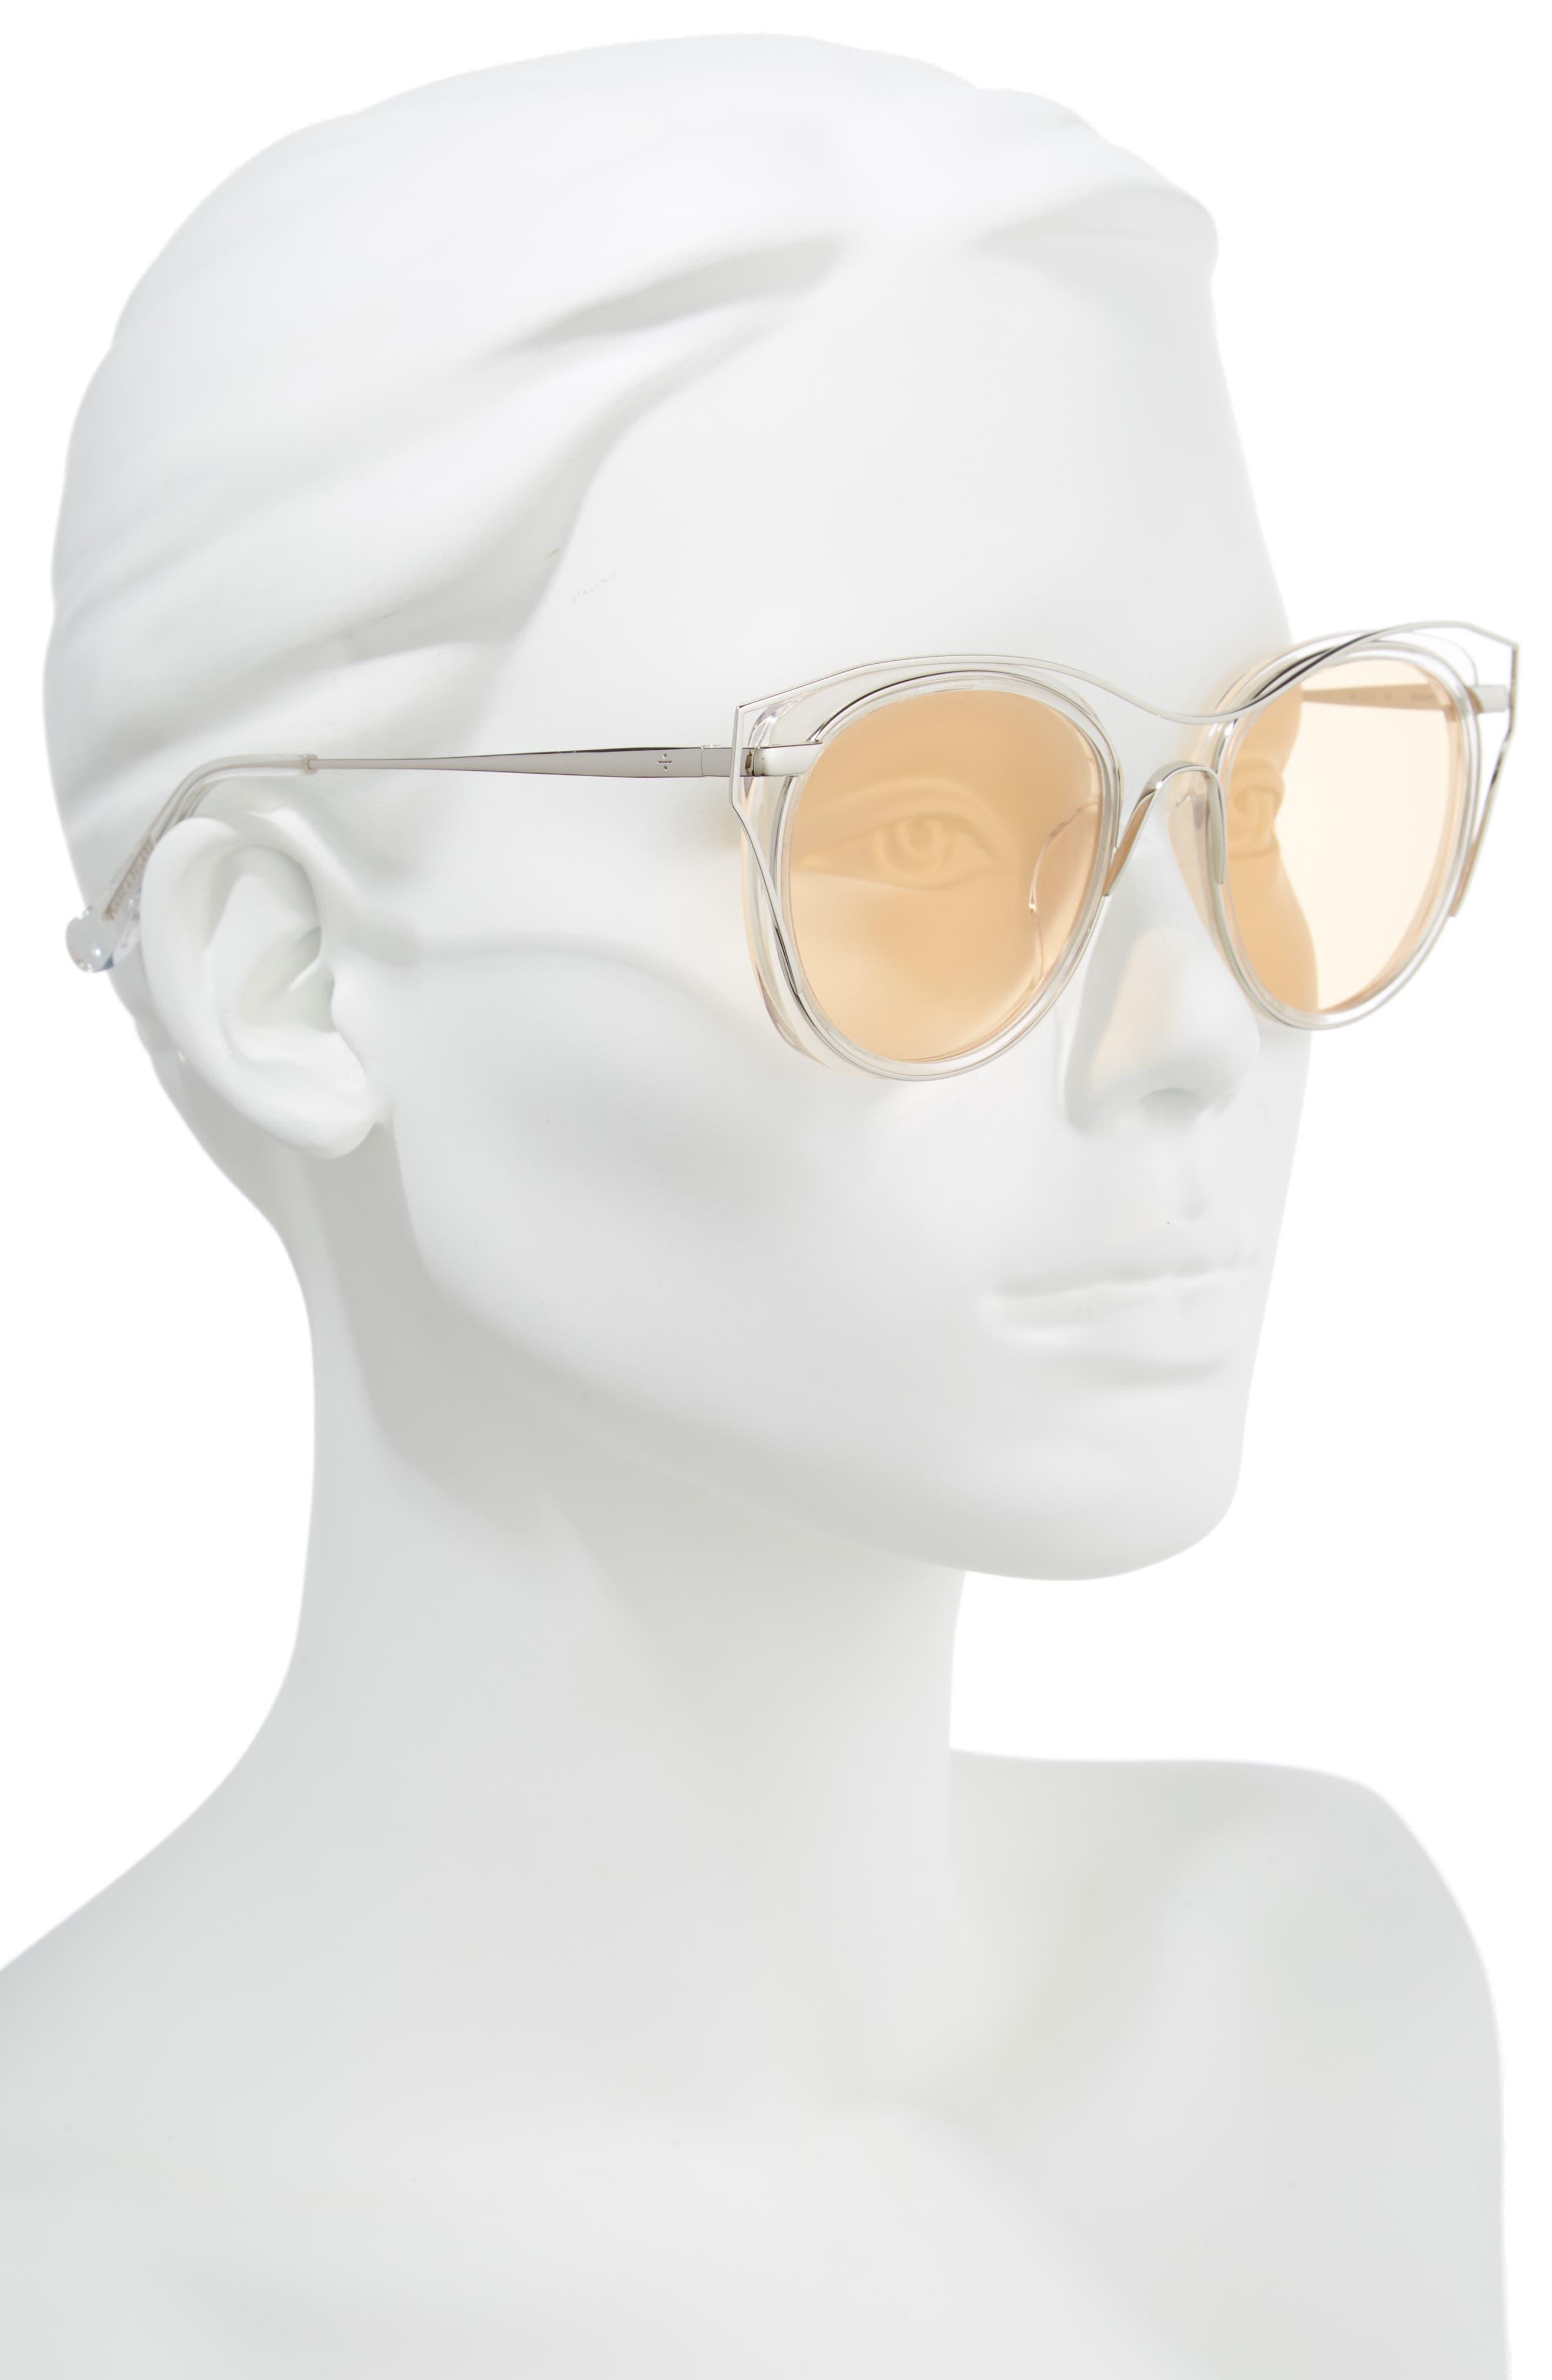 BLANC & ECLARE Singapore 55mm Polarized Sunglasses,                             Alternate thumbnail 2, color,                             Transparent/ Slv/ Orange